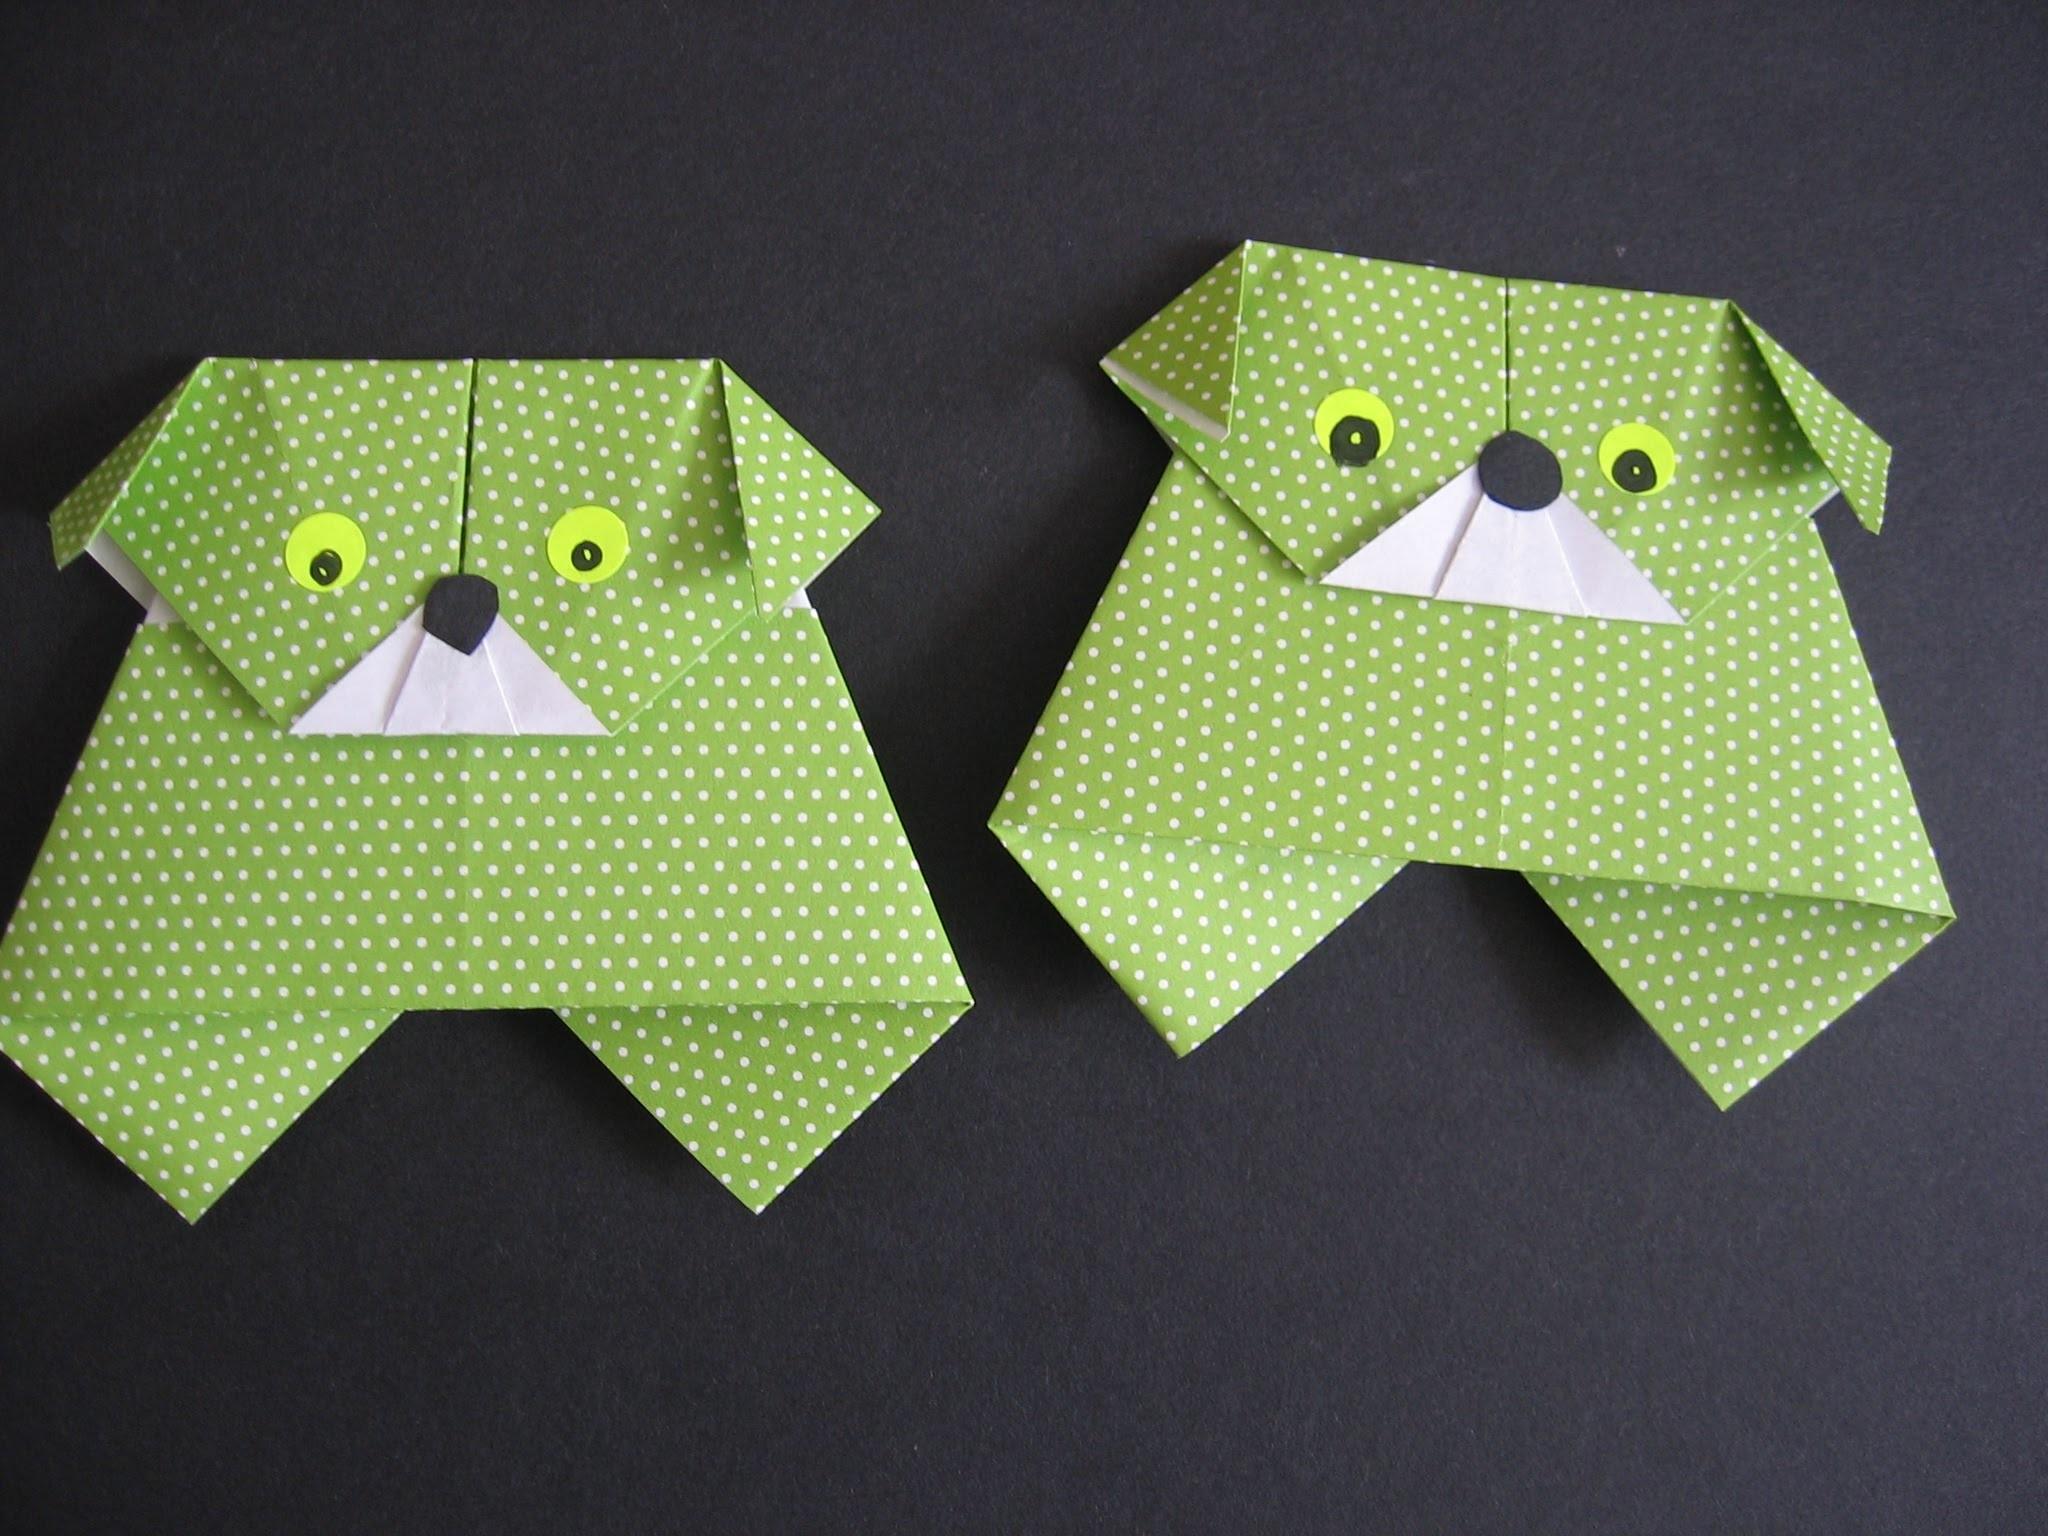 Origami Hund falten, Papier falten